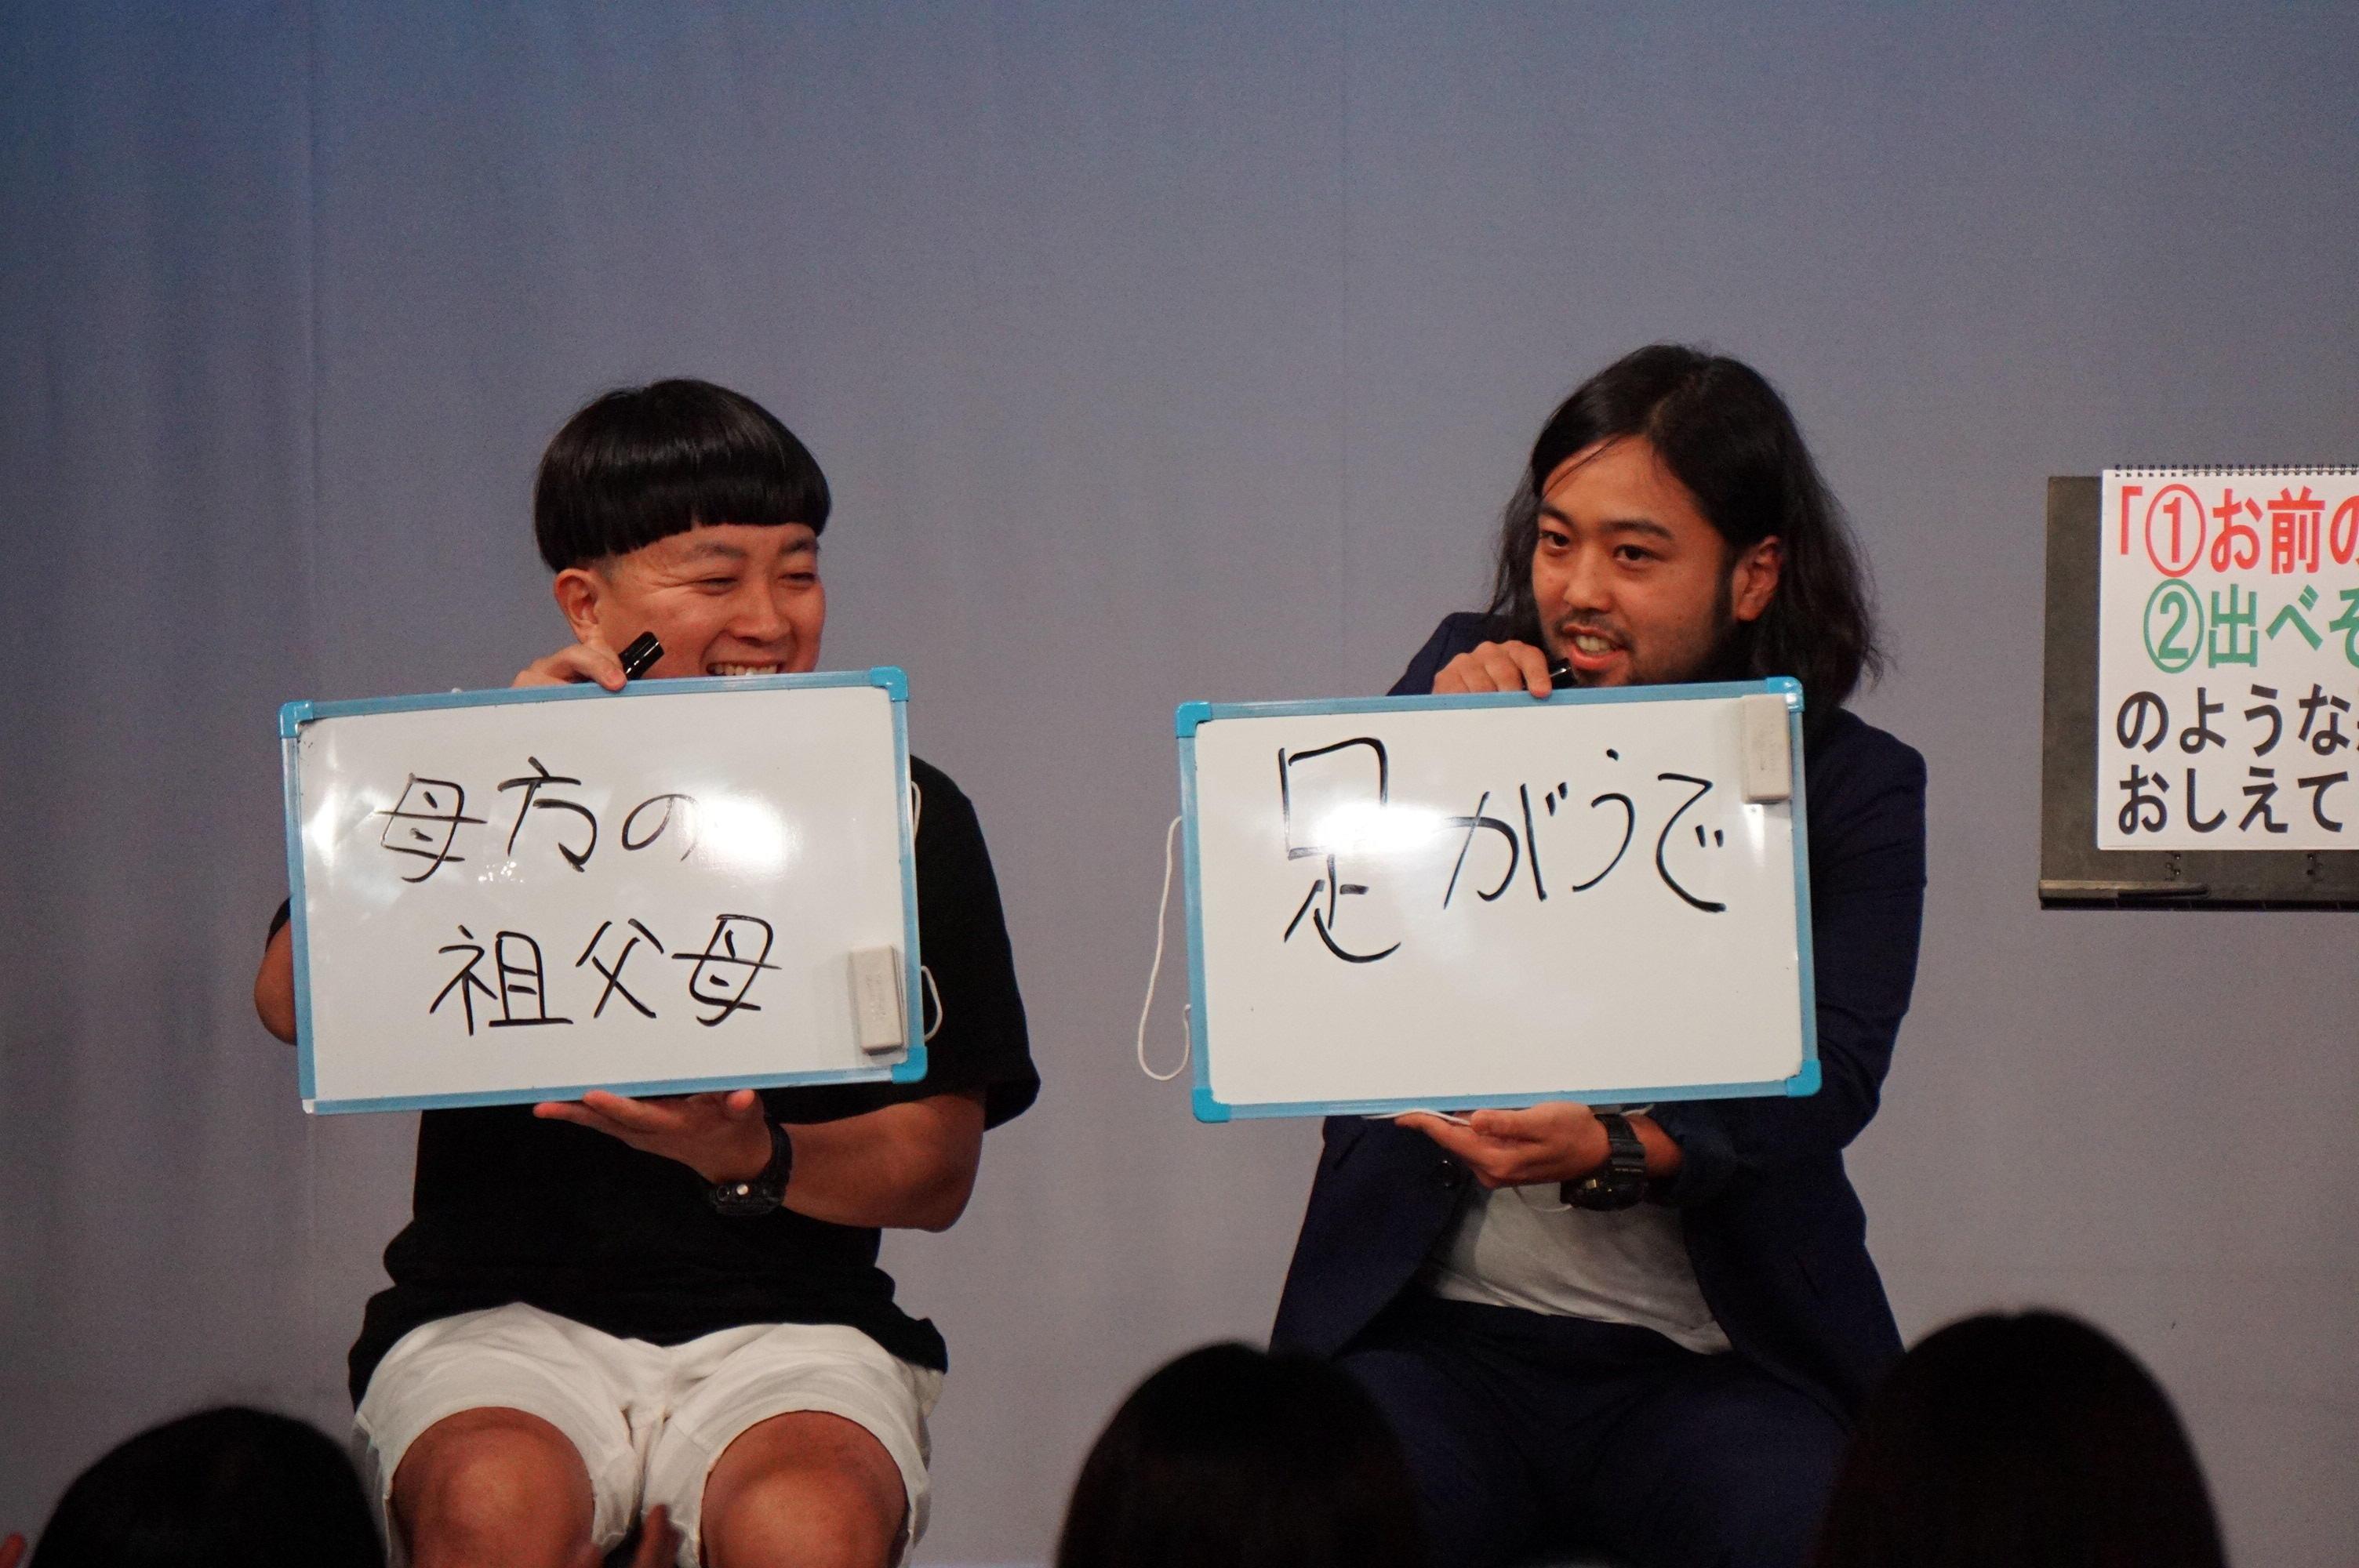 http://news.yoshimoto.co.jp/20160526175111-2ed0d51f681906639c43cd9ca198713d1070659b.jpg